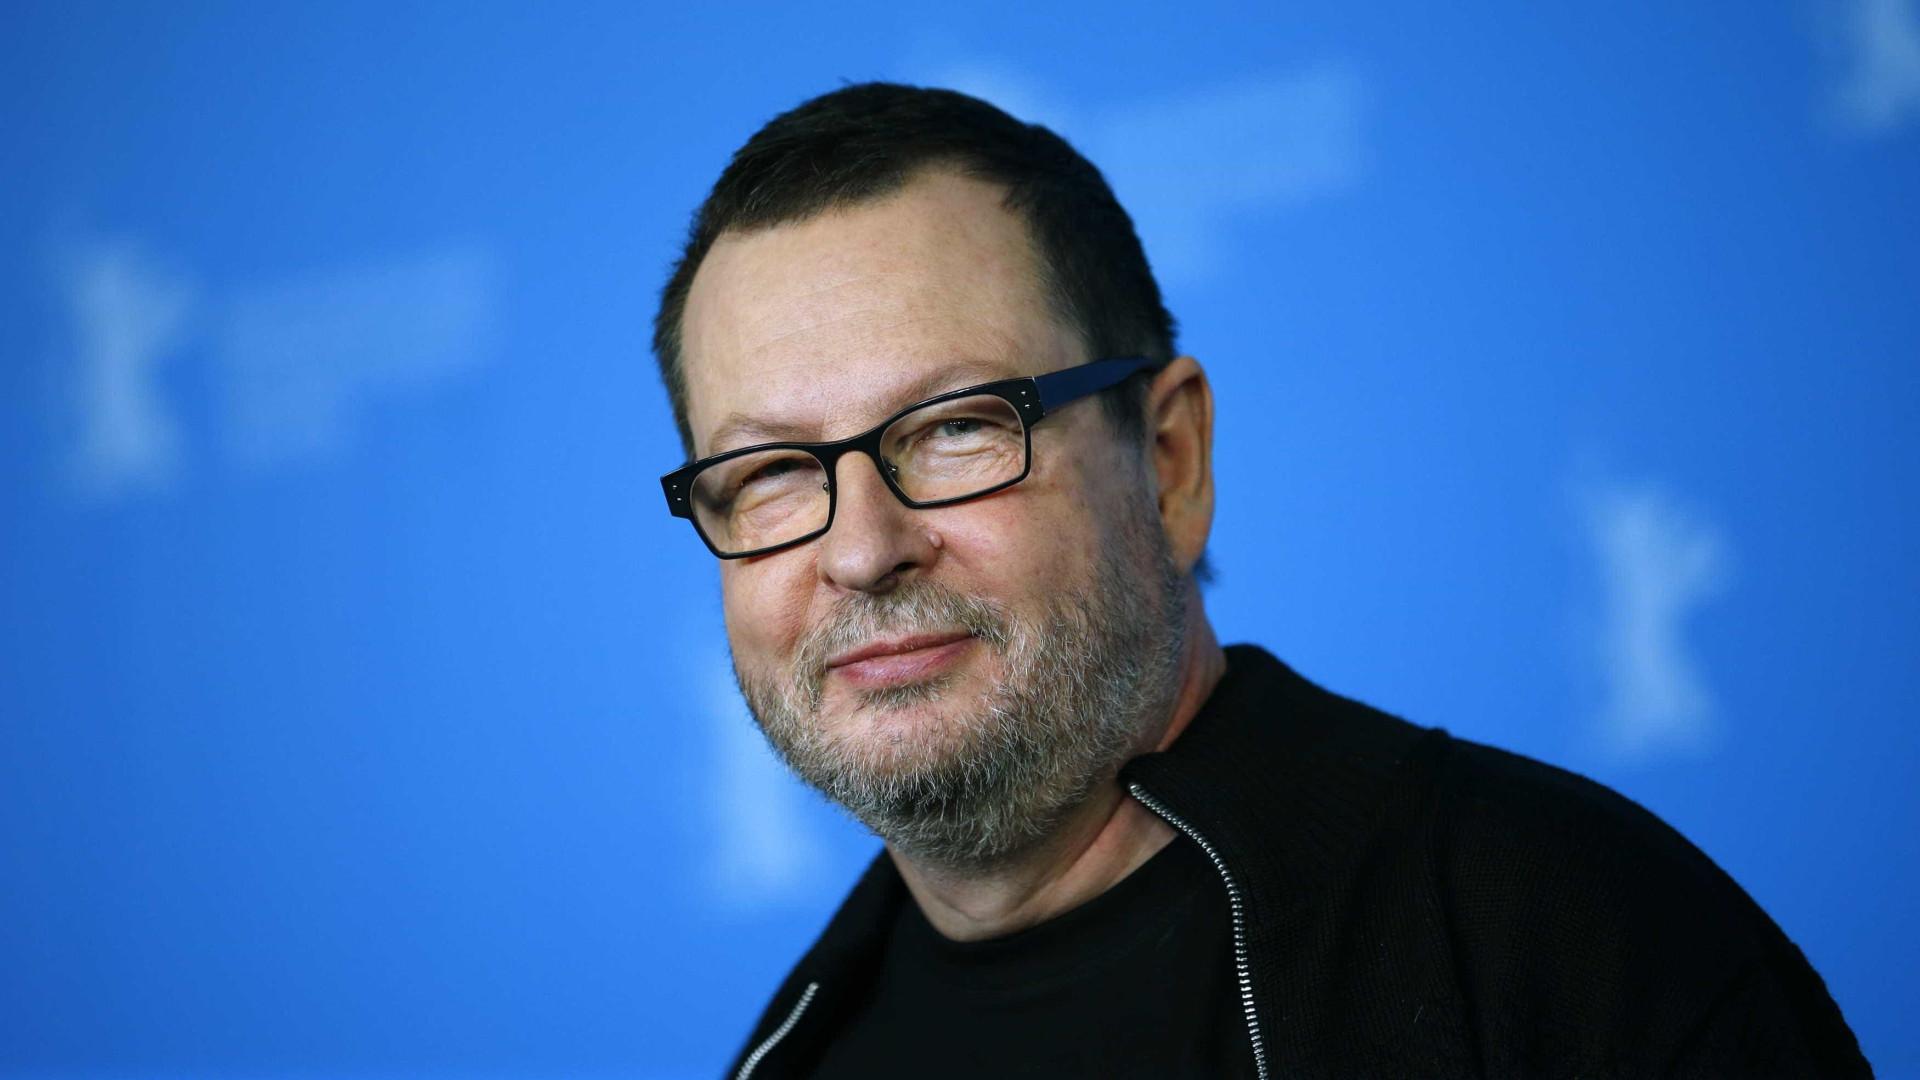 Lars von Trier pode deixar de ser 'persona non grata' em Cannes